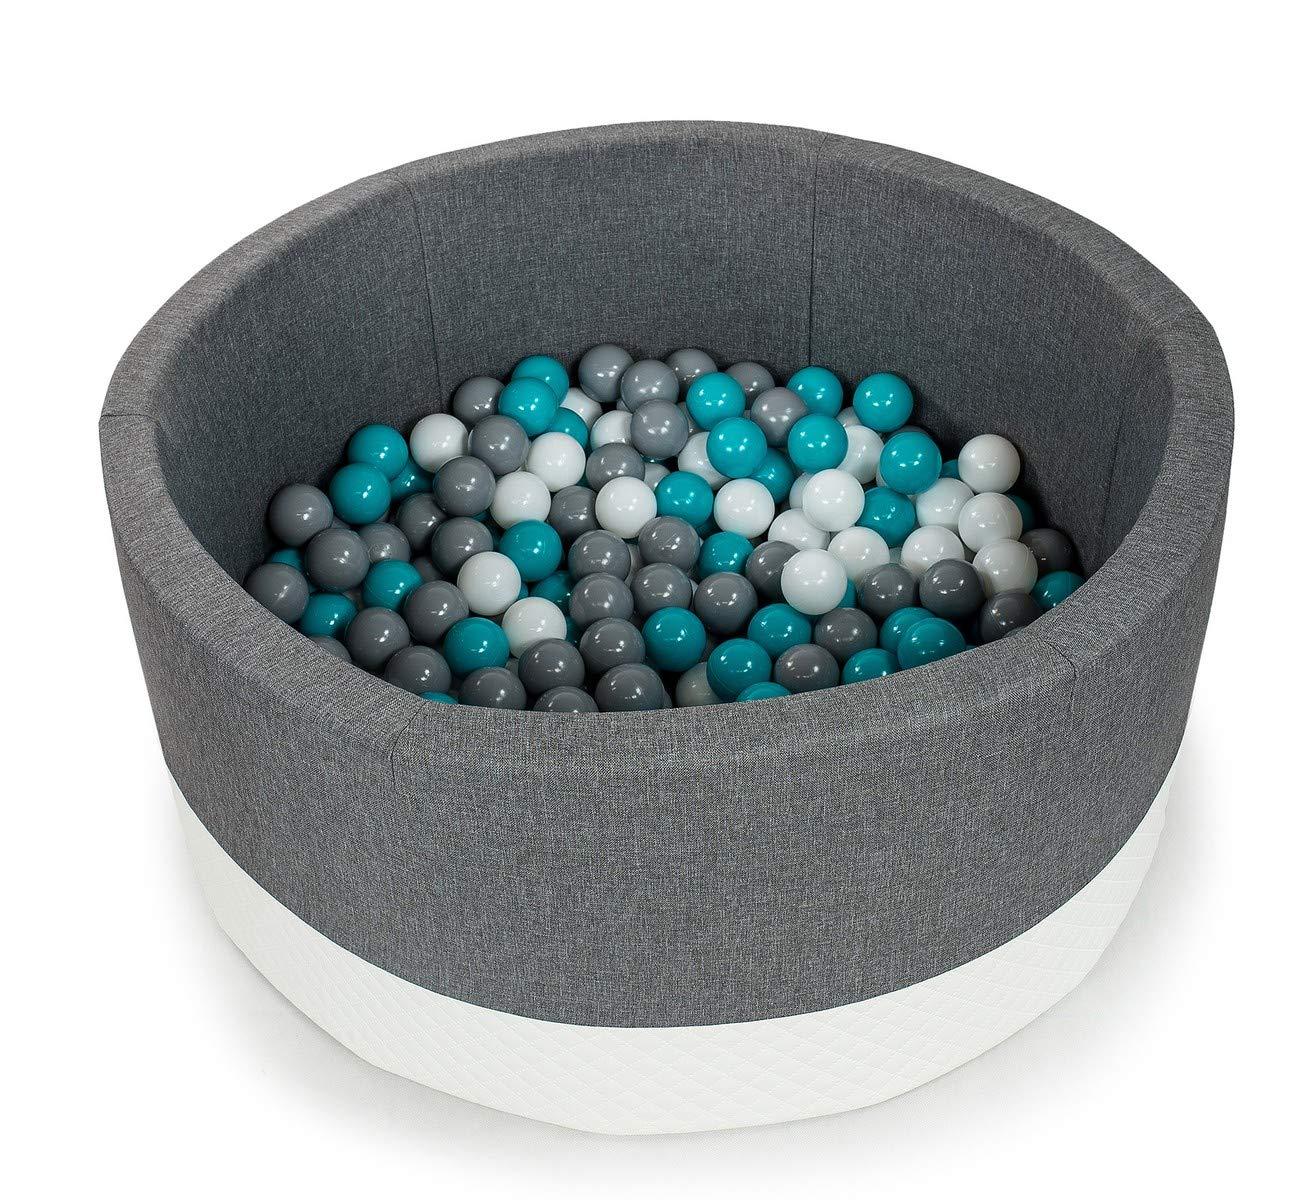 Tweepsy Soft Baby Round Ball Pool Pit 250 Balls 90x40cm Handmade EU - BKOE2N - eco-Grey Pool: Turquoise, White, Grey